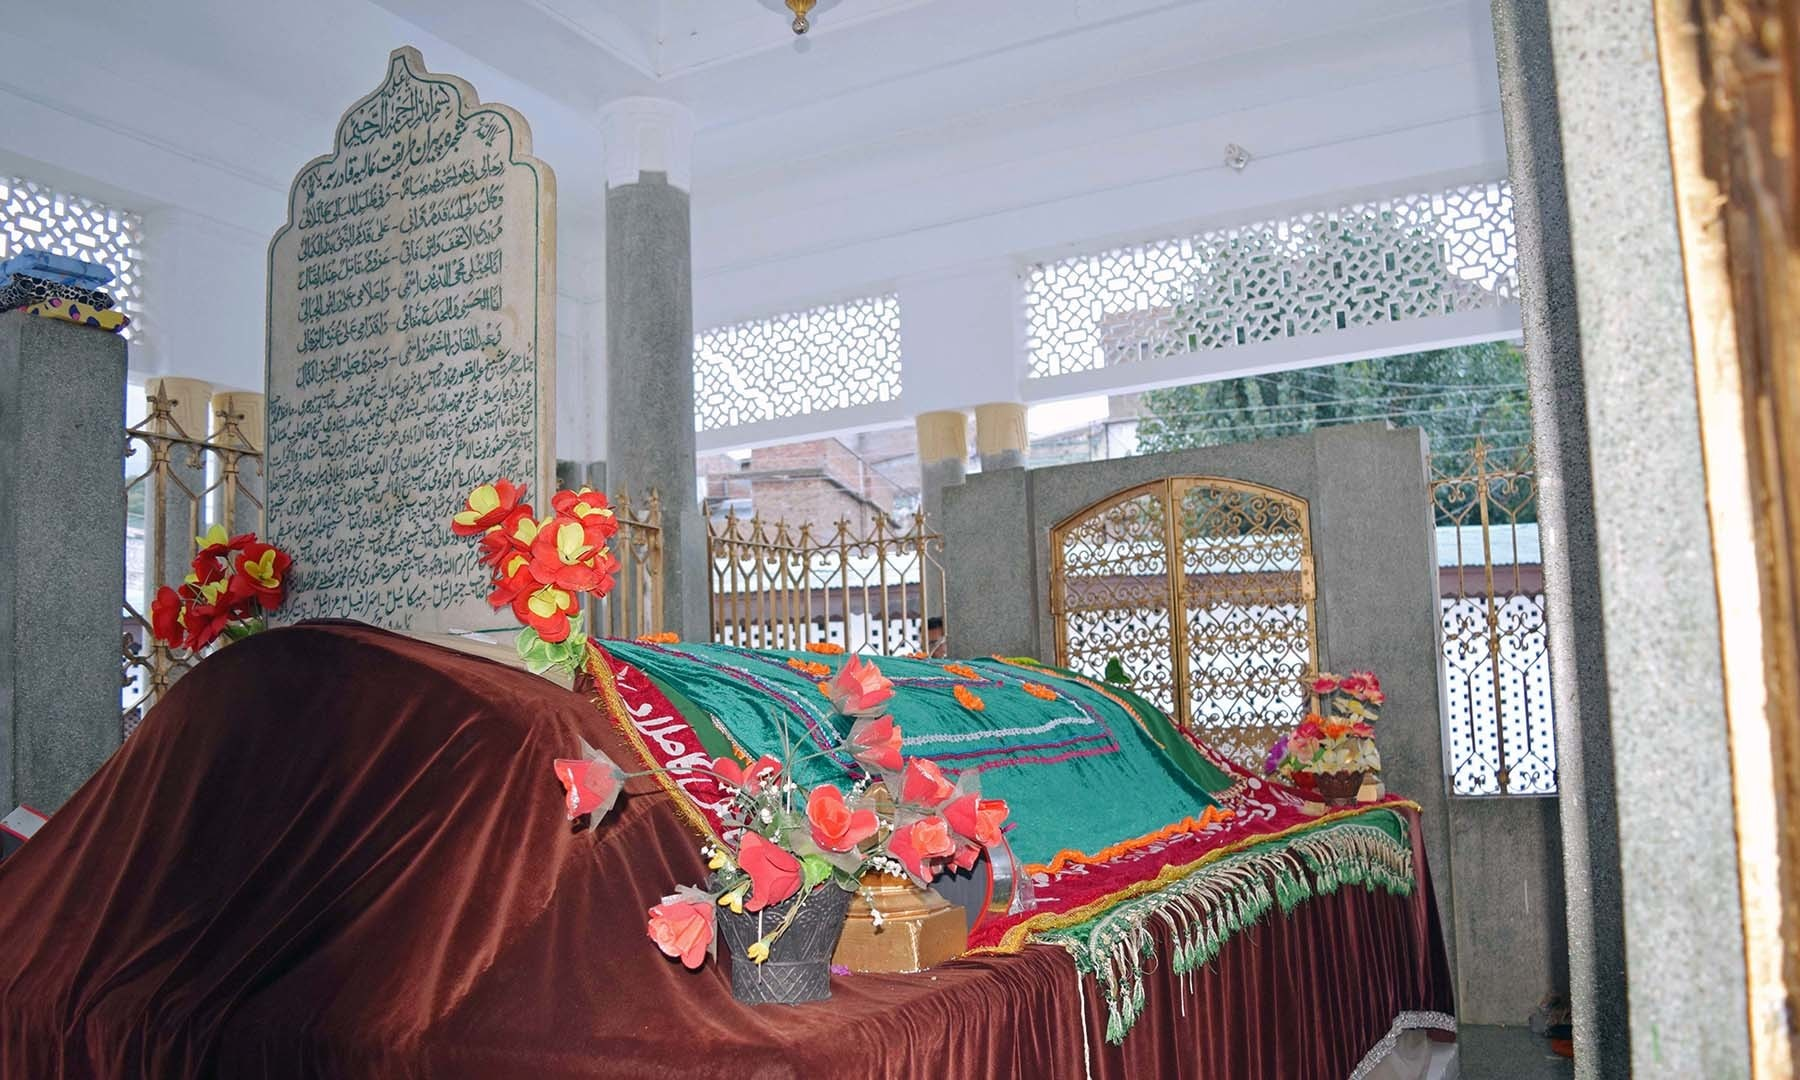 سیدو بابا کا مزار— فوٹو امجد علی سحاب